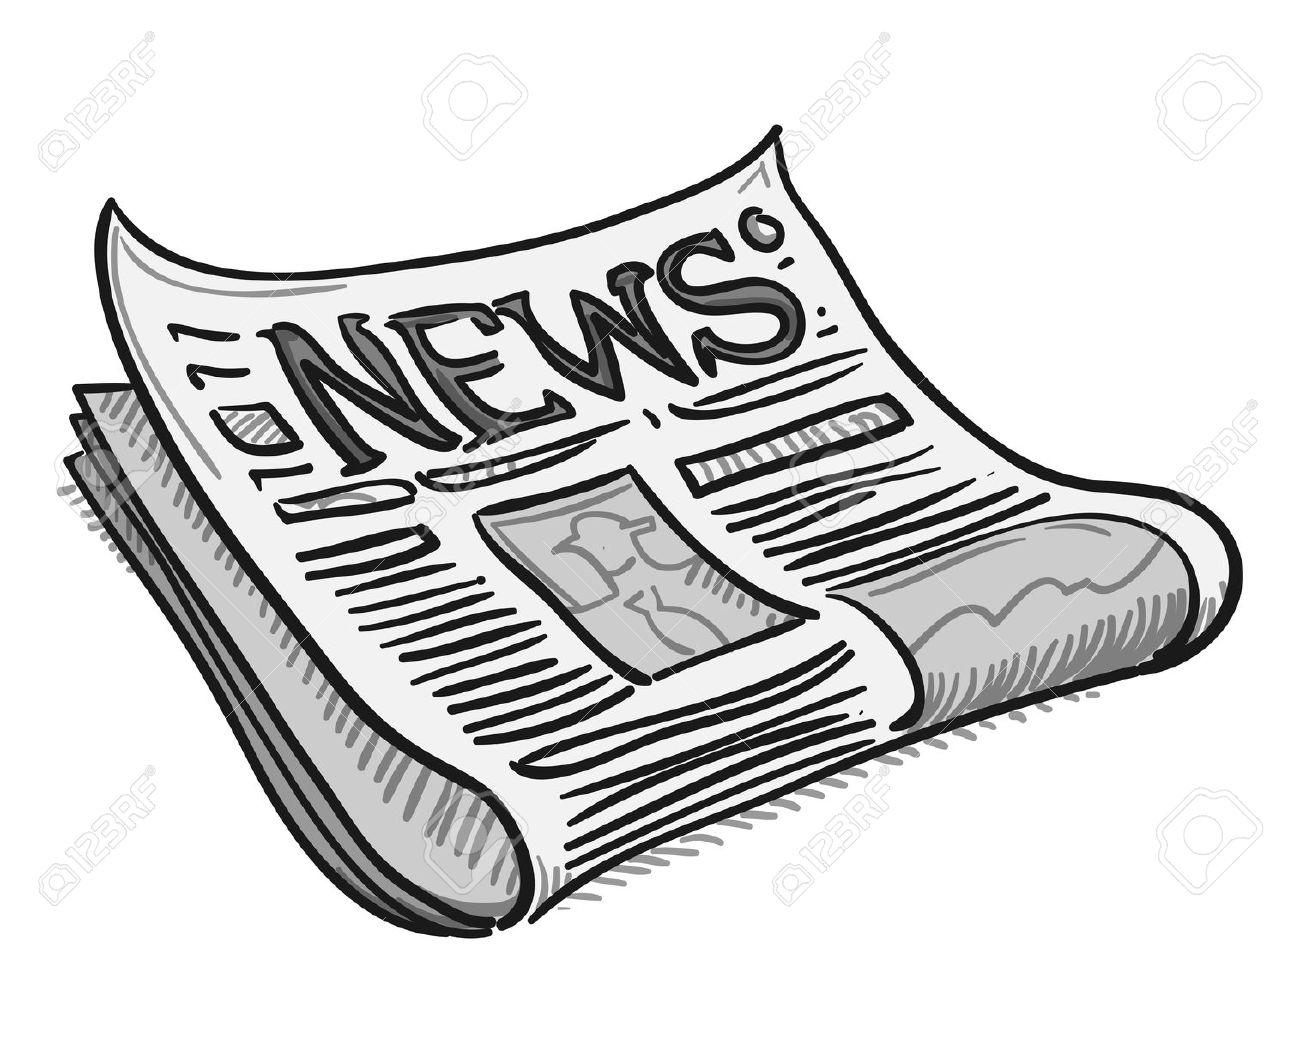 Newspaper: Newspaper Cover-newspaper: Newspaper Cover-14